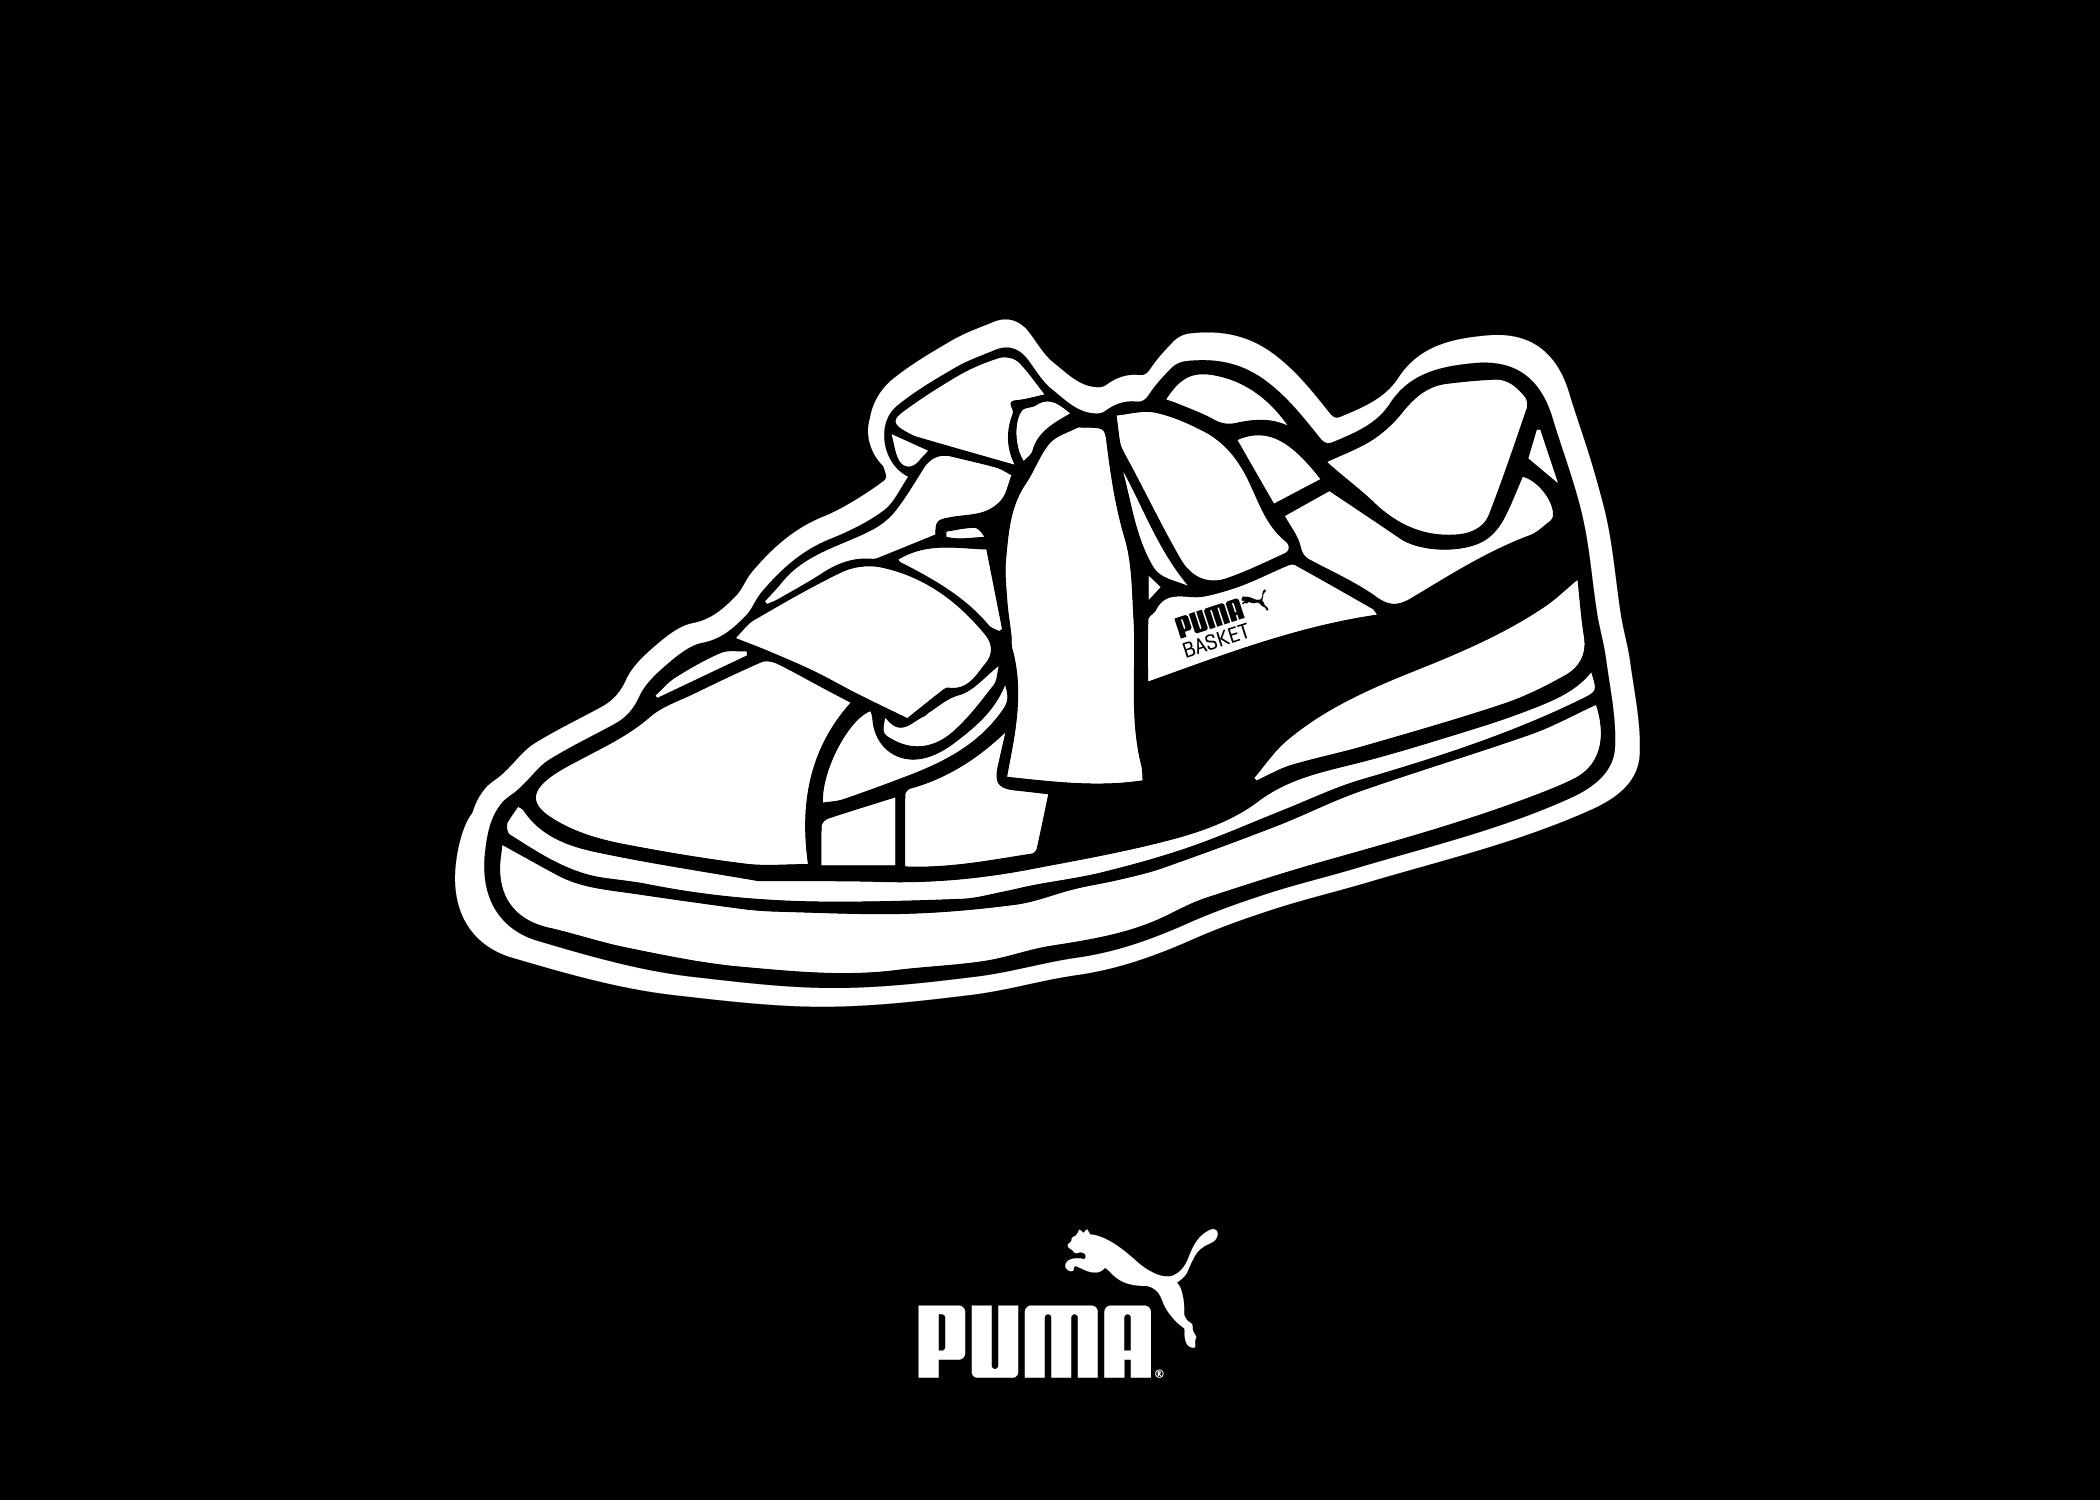 PUMA-1135_No-go_SeedingCards_PR-Social_7x5-06.jpg